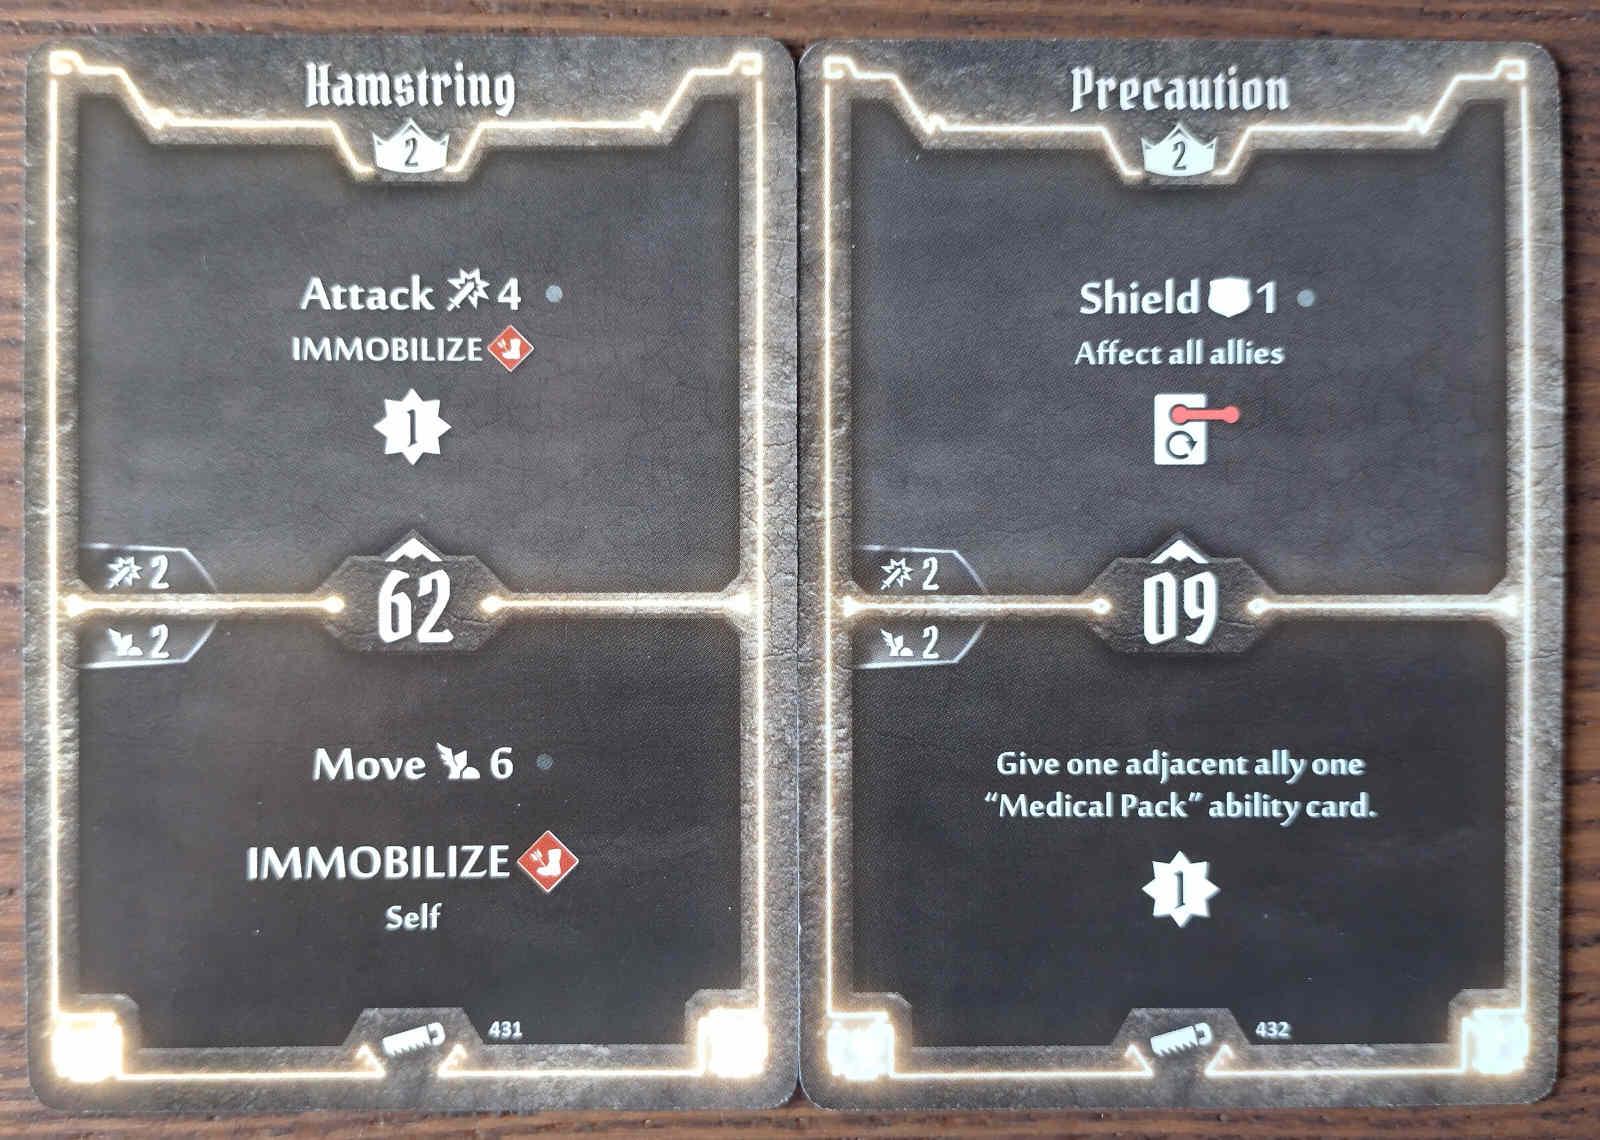 Level 2 Sawbones cards - Hamstring and Precaution